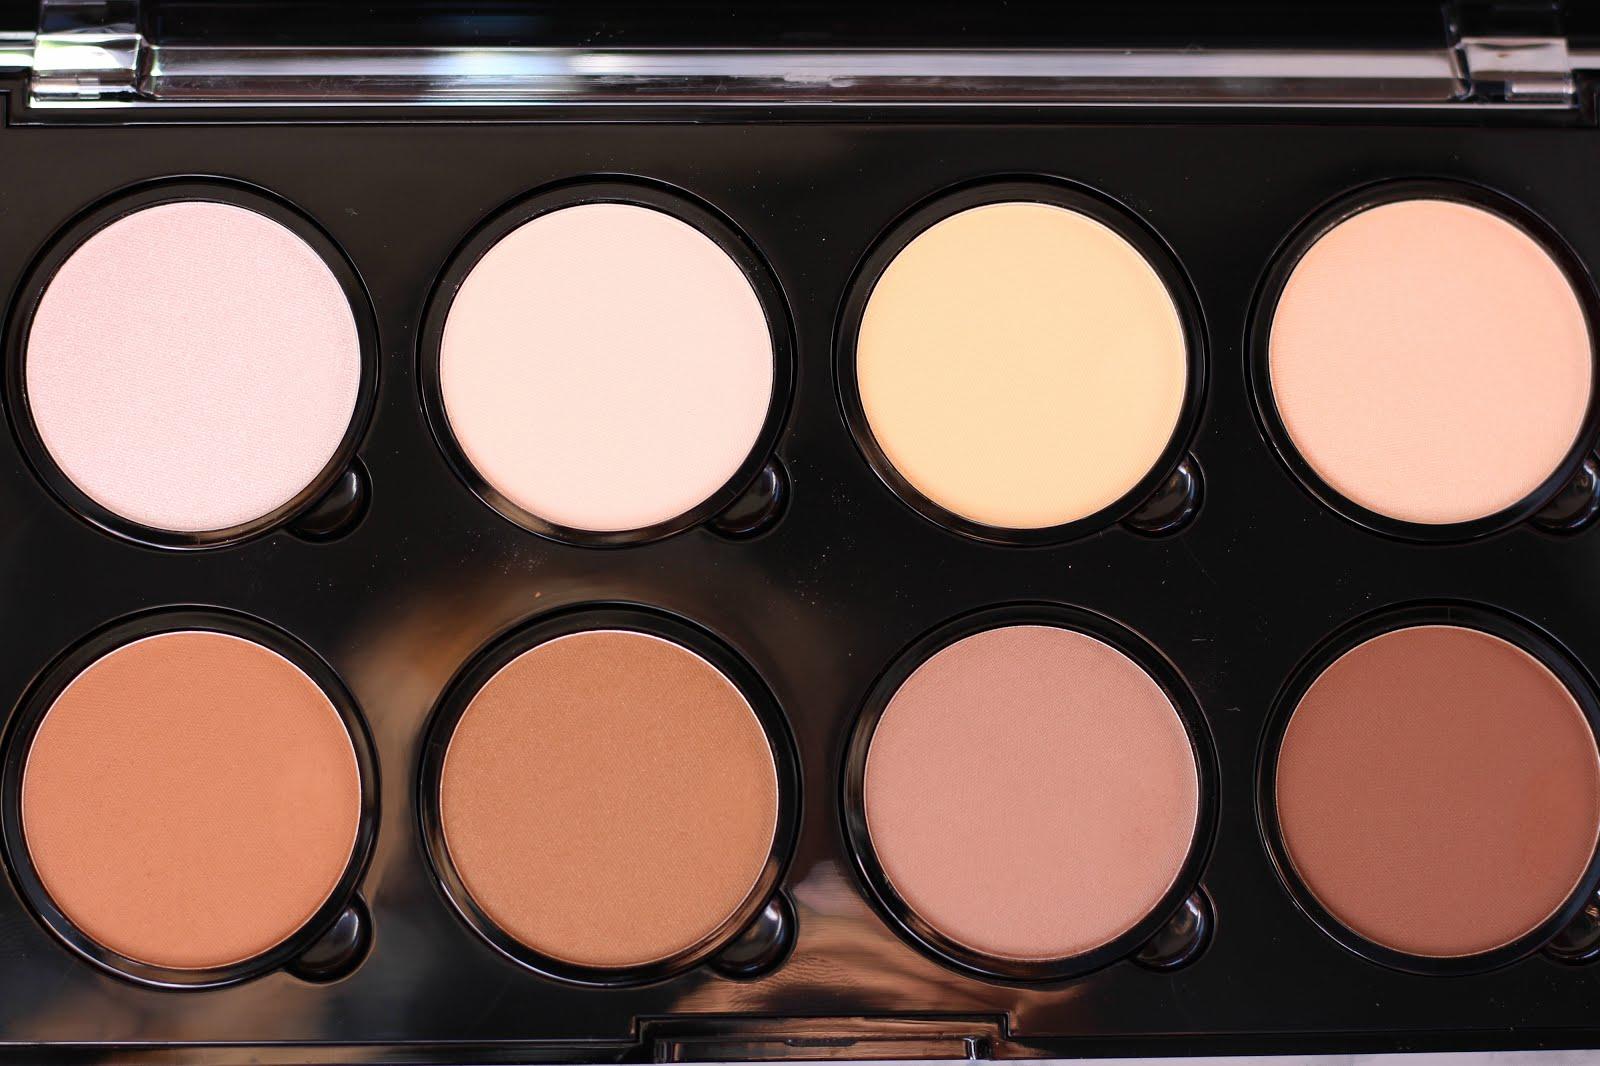 nyx contour palette, nyx highlight & contour pro palette, nyx pro palette, nyx contouring palette